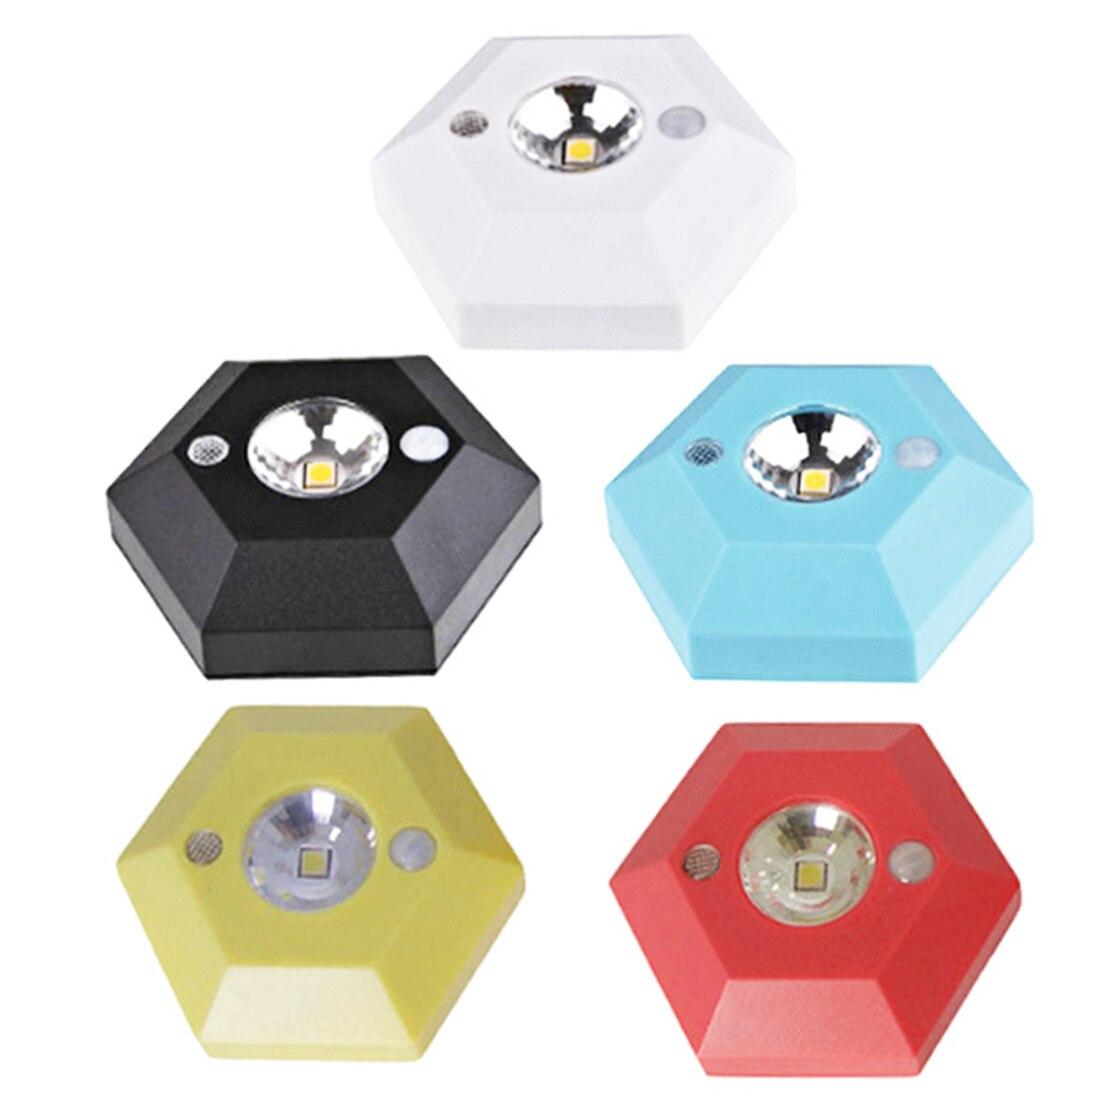 Hexagon Body Induction Lamp 1pc Motion Sensor Light 4.5V High-brightness LED Wardrobe Corridor Door Lock Drawer Lamp